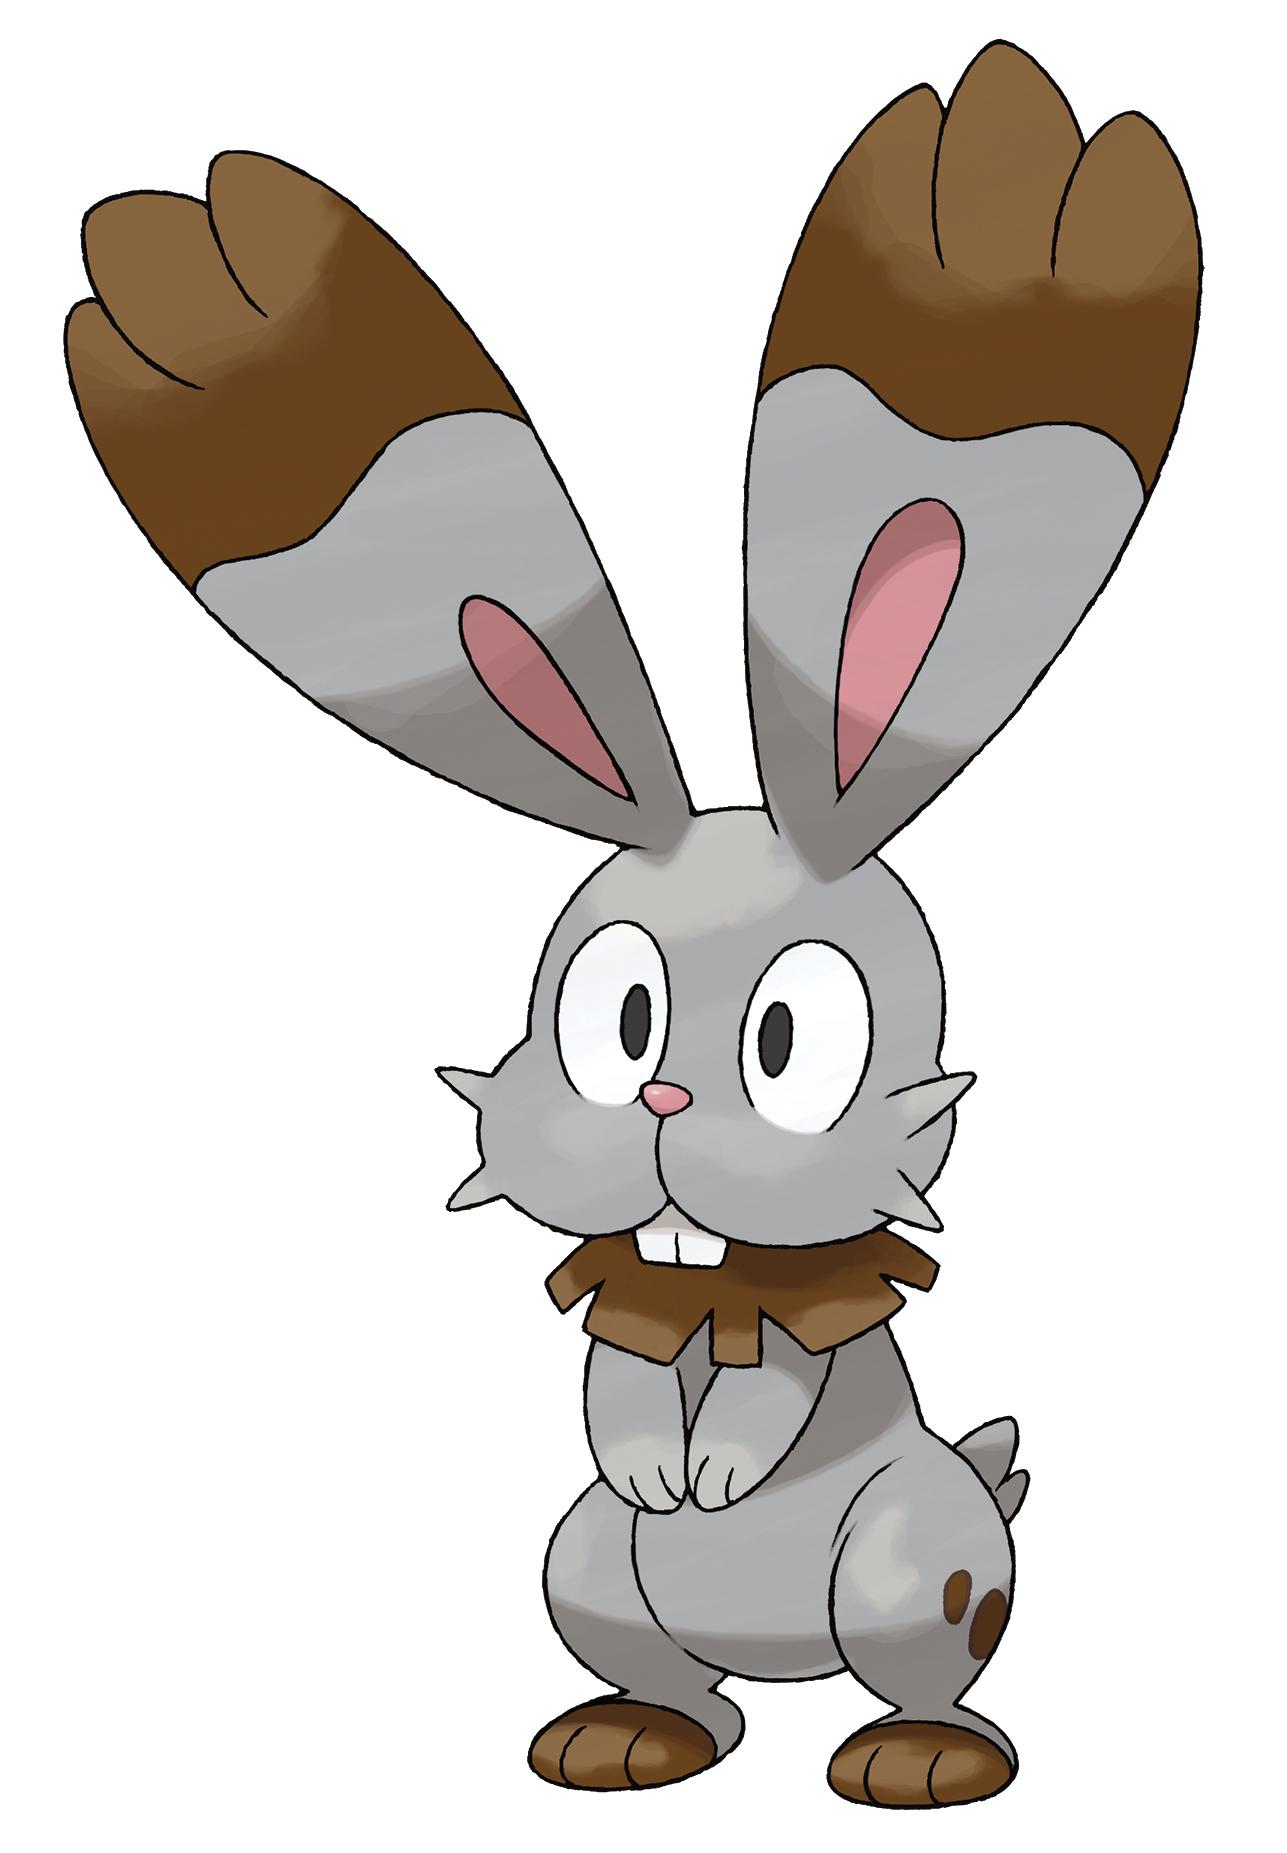 Pok mon x y mega evolution new pok mon names confirmed - X evolution pokemon ...